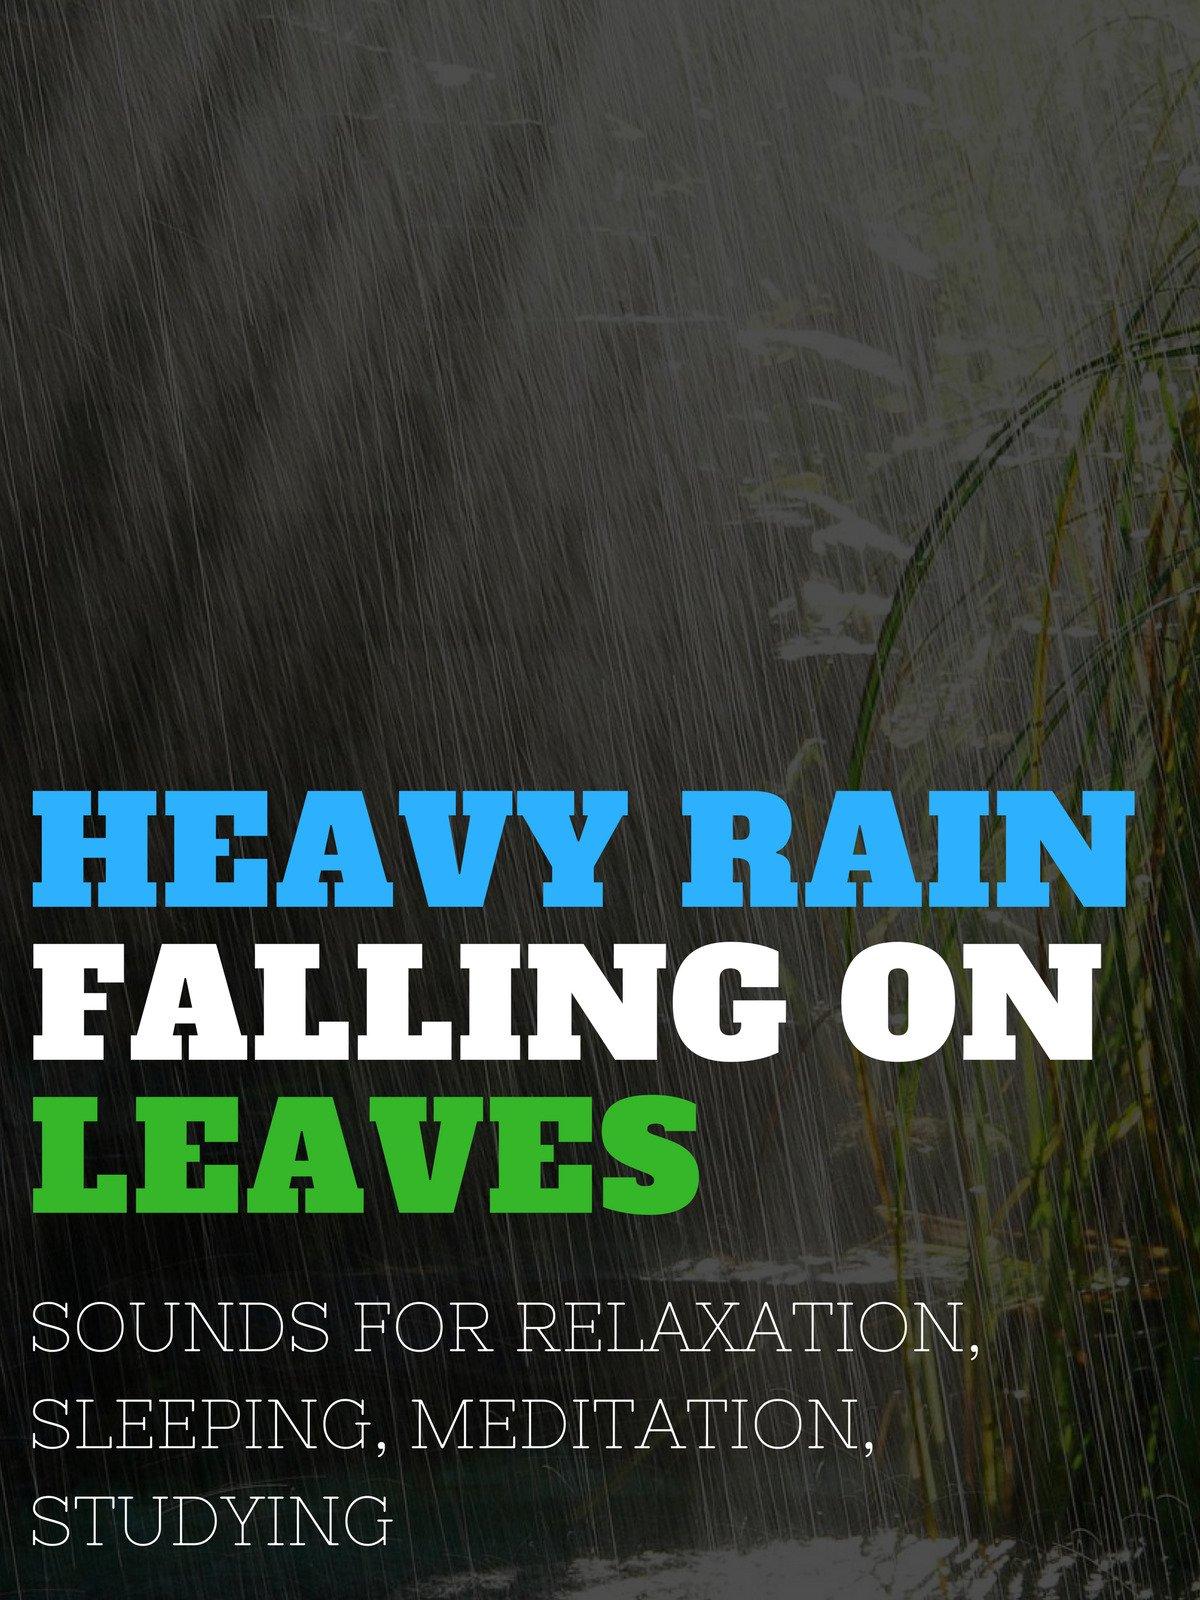 Heavy Rain Falling on Leaves